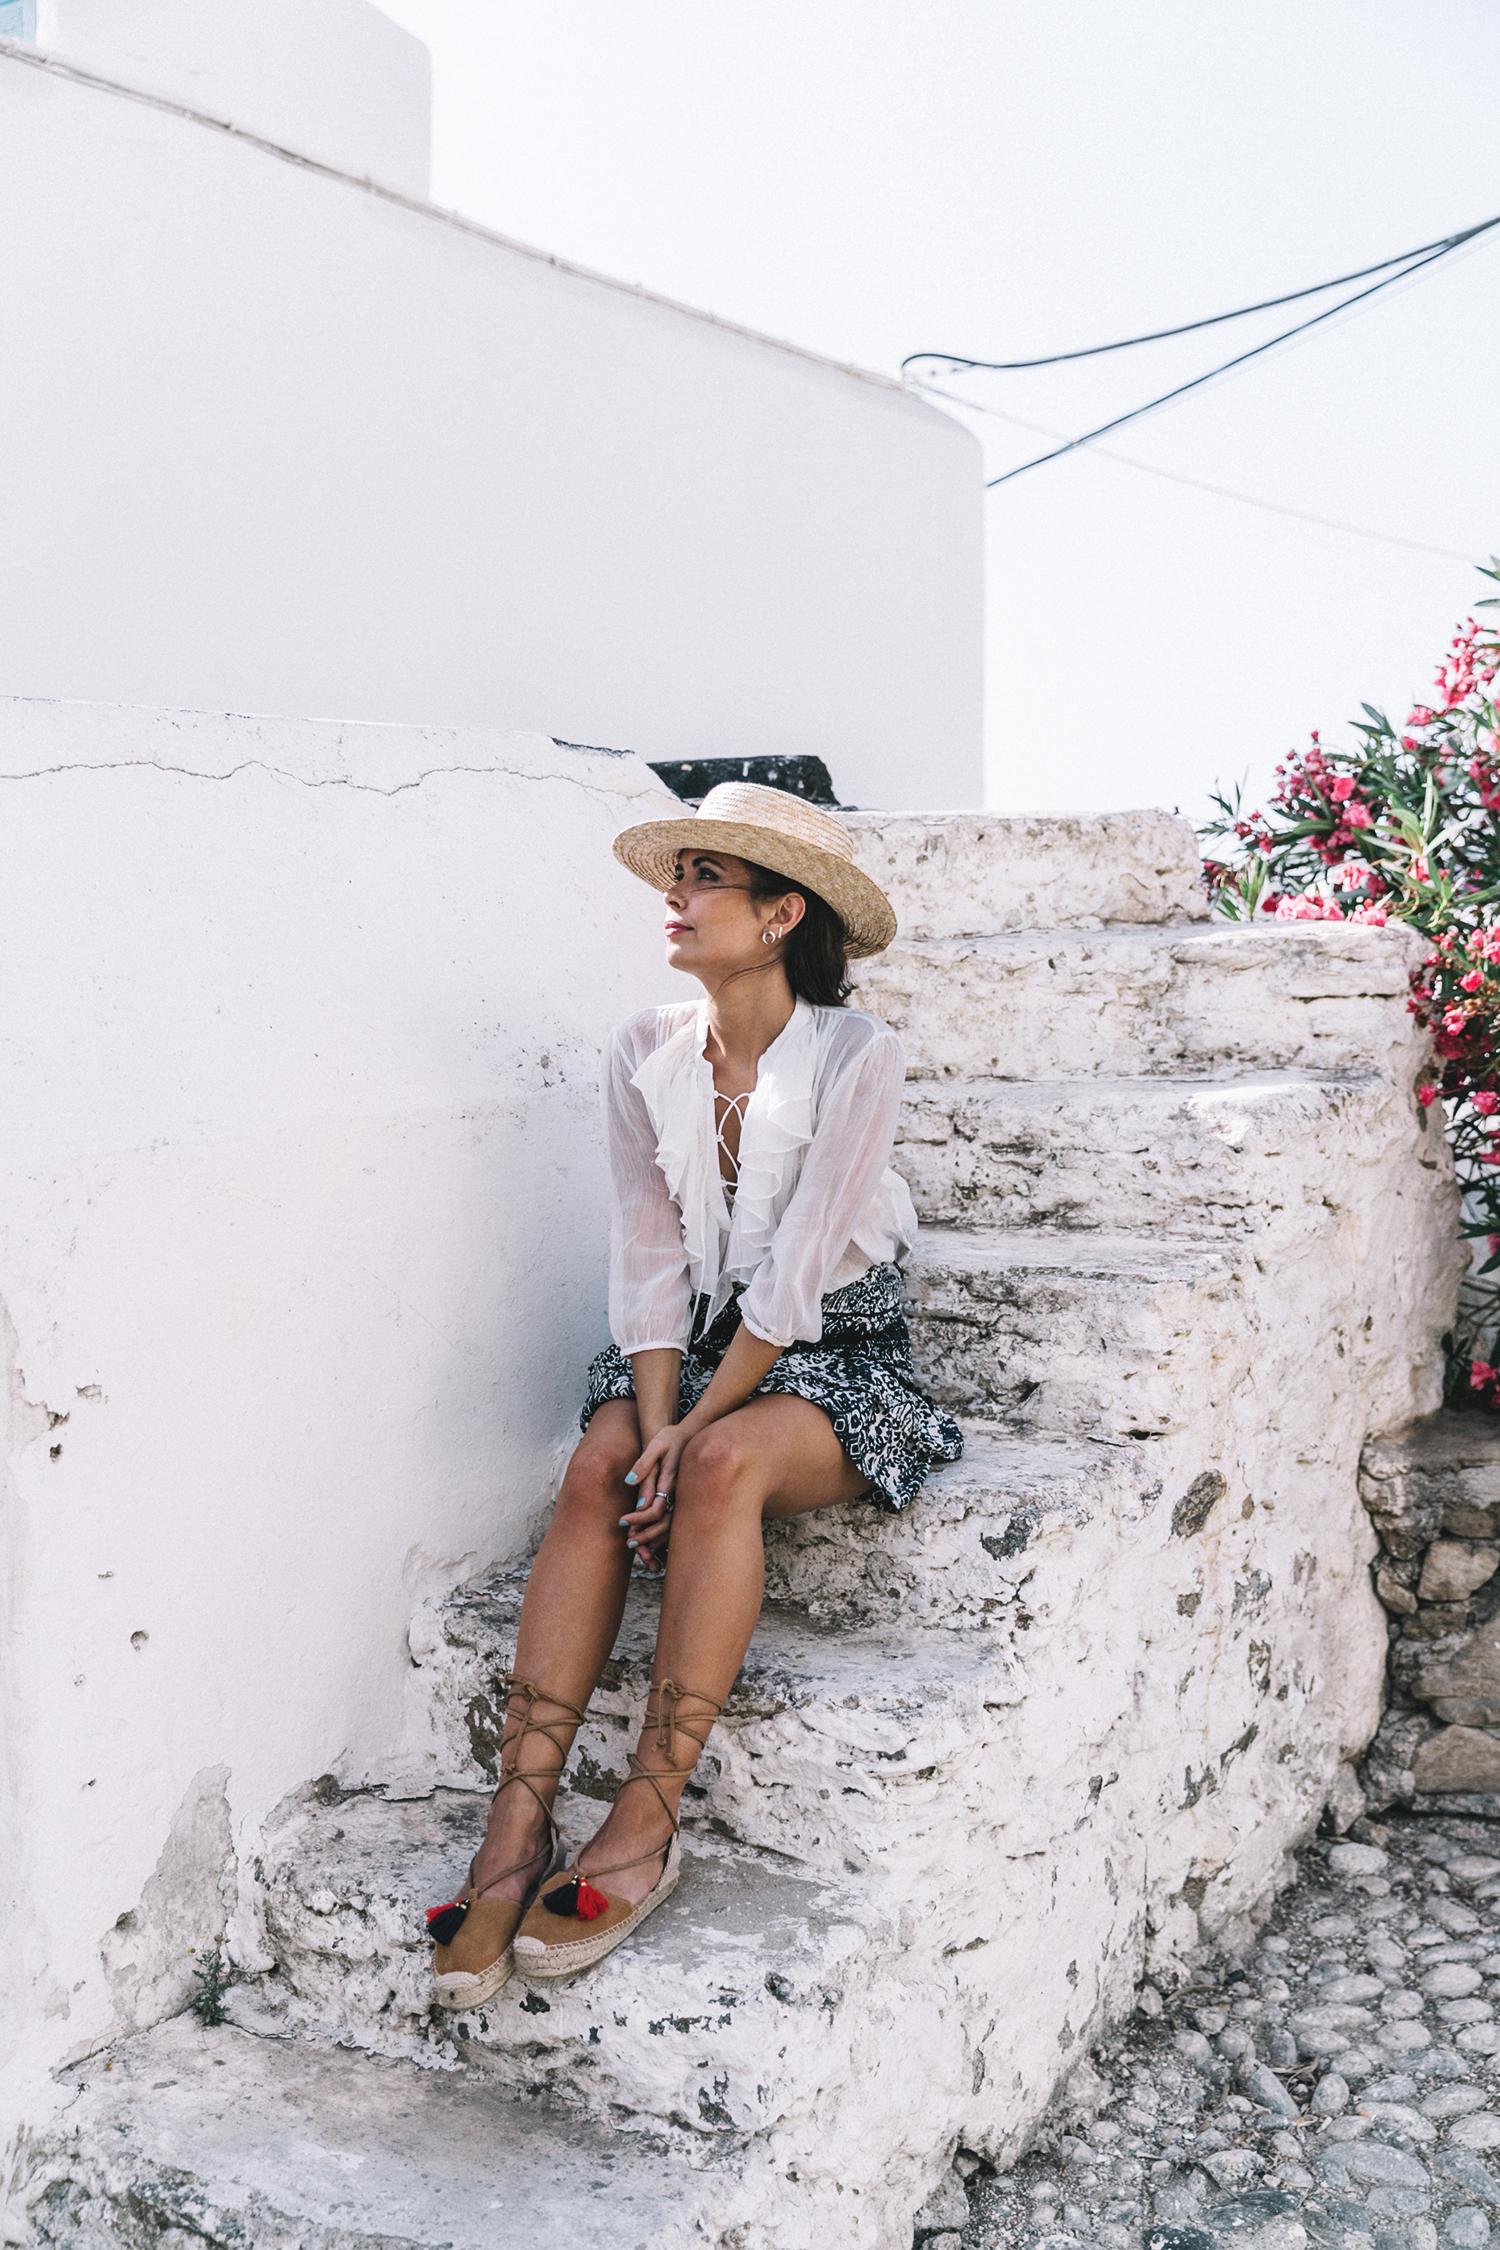 Lace_up_Blouse-Ralph_Lauren-Soludos_Espadrilles-Soludos_Escapes-Skirt-Straw_Hat-Canotier-Lack_Of_Color-Street_Style-Mykonos-Greece-Collage_Vintage-2